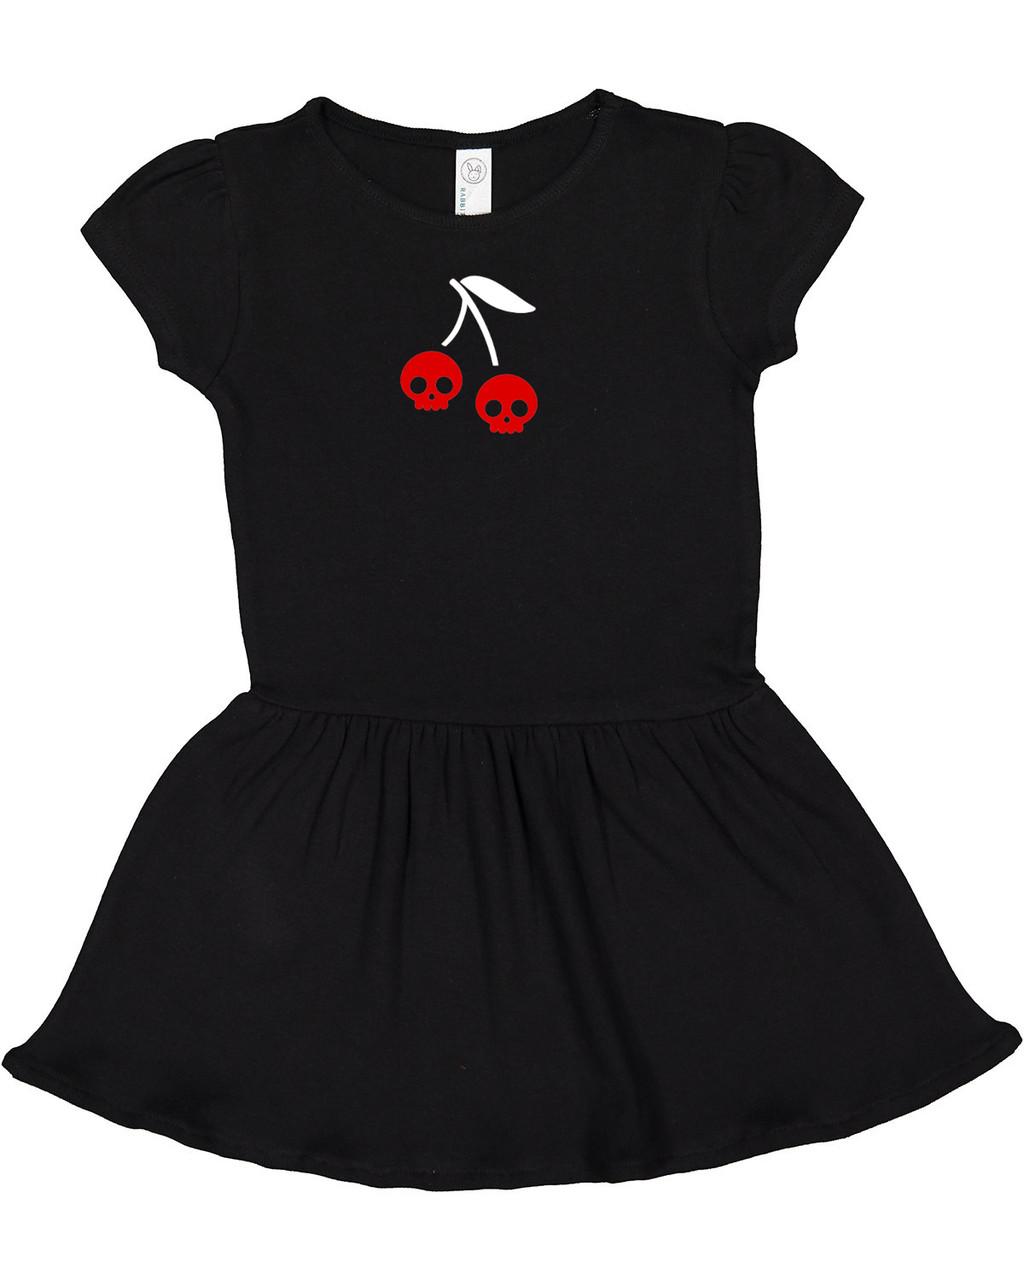 Punk Rock Cherry Skull Cotton Black Infant & Toddler Dress